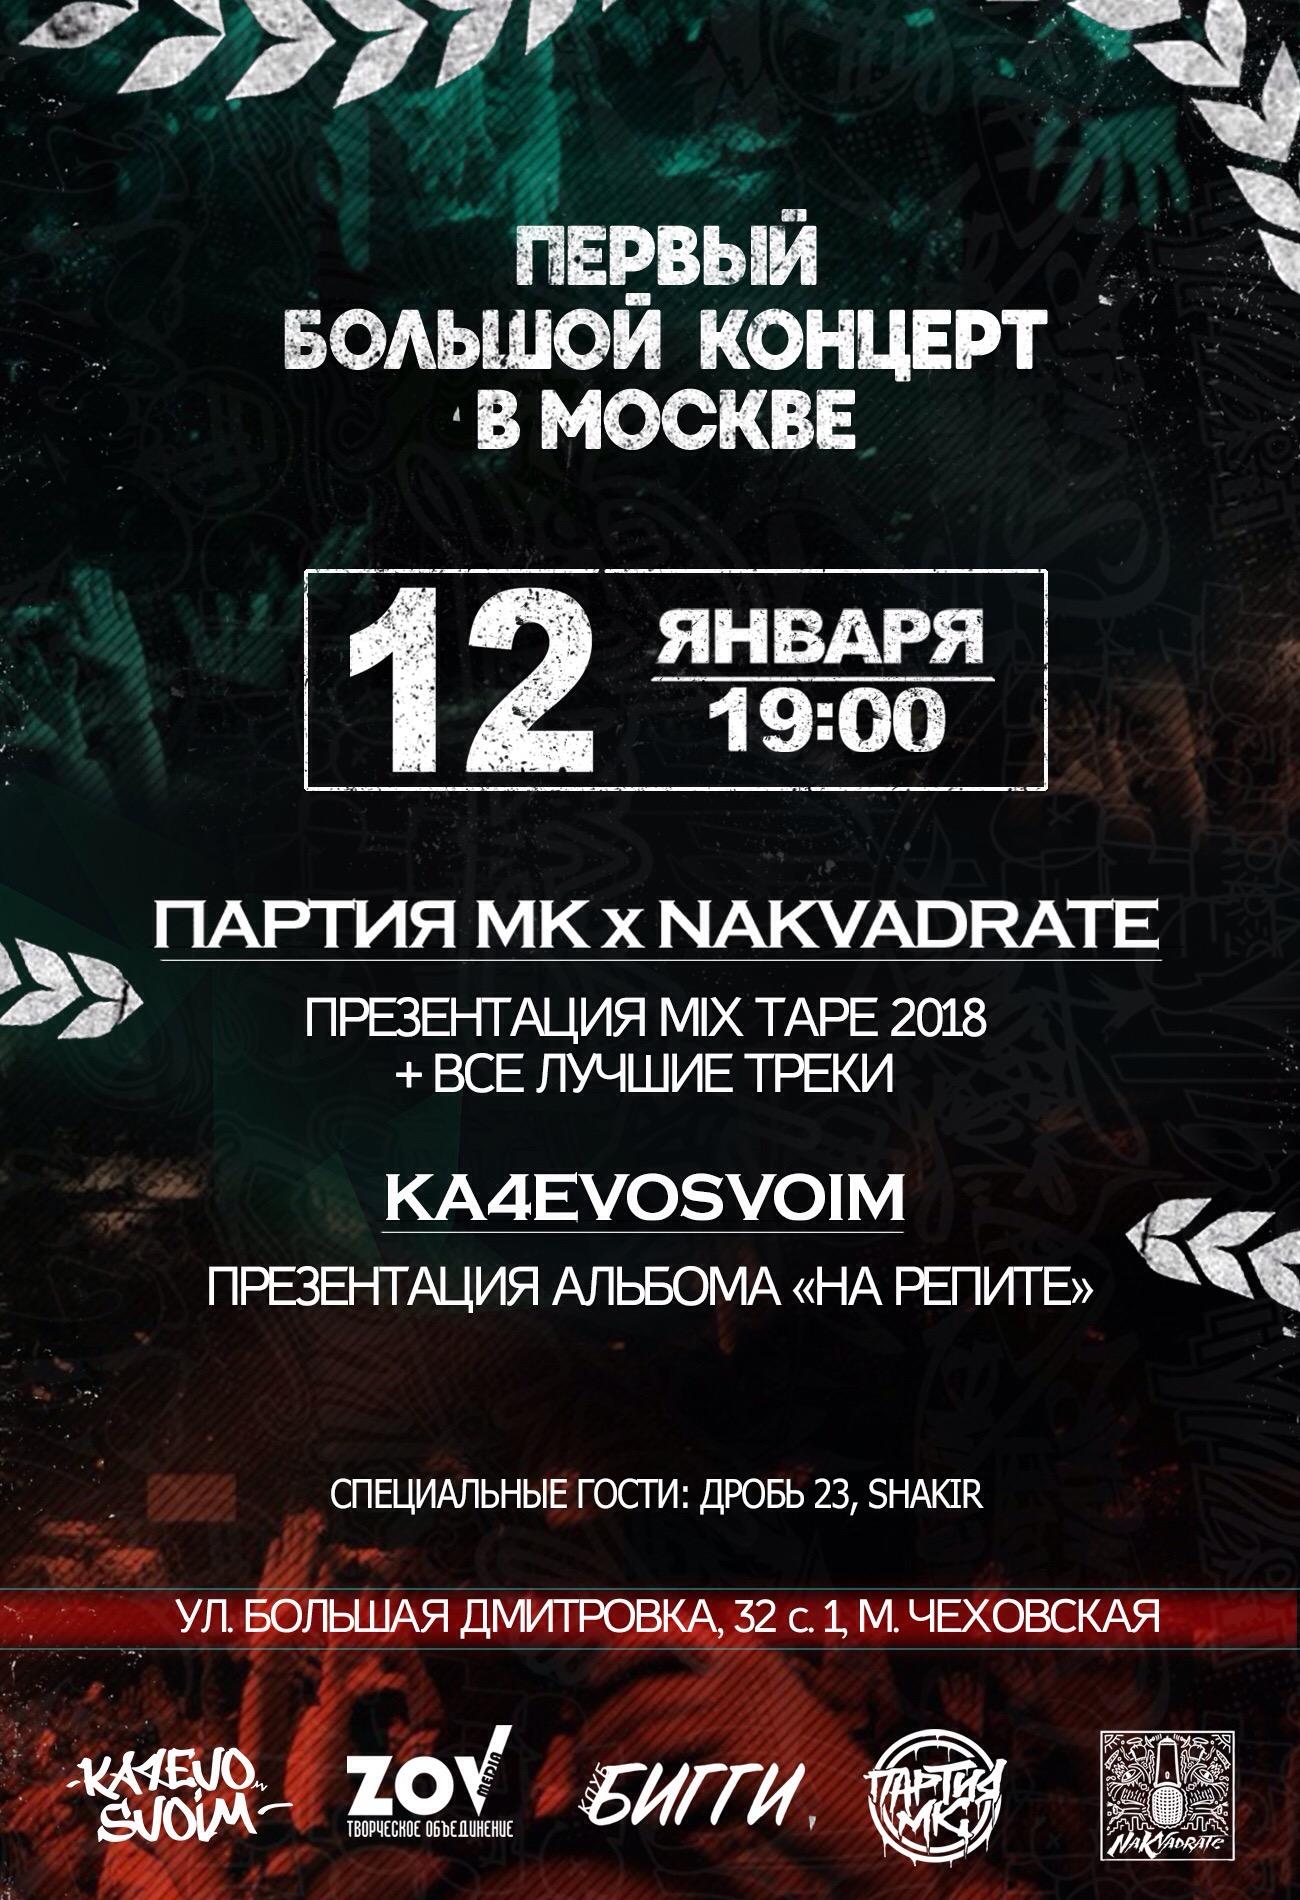 ПАРТИЯ МК, NAKVADRATE